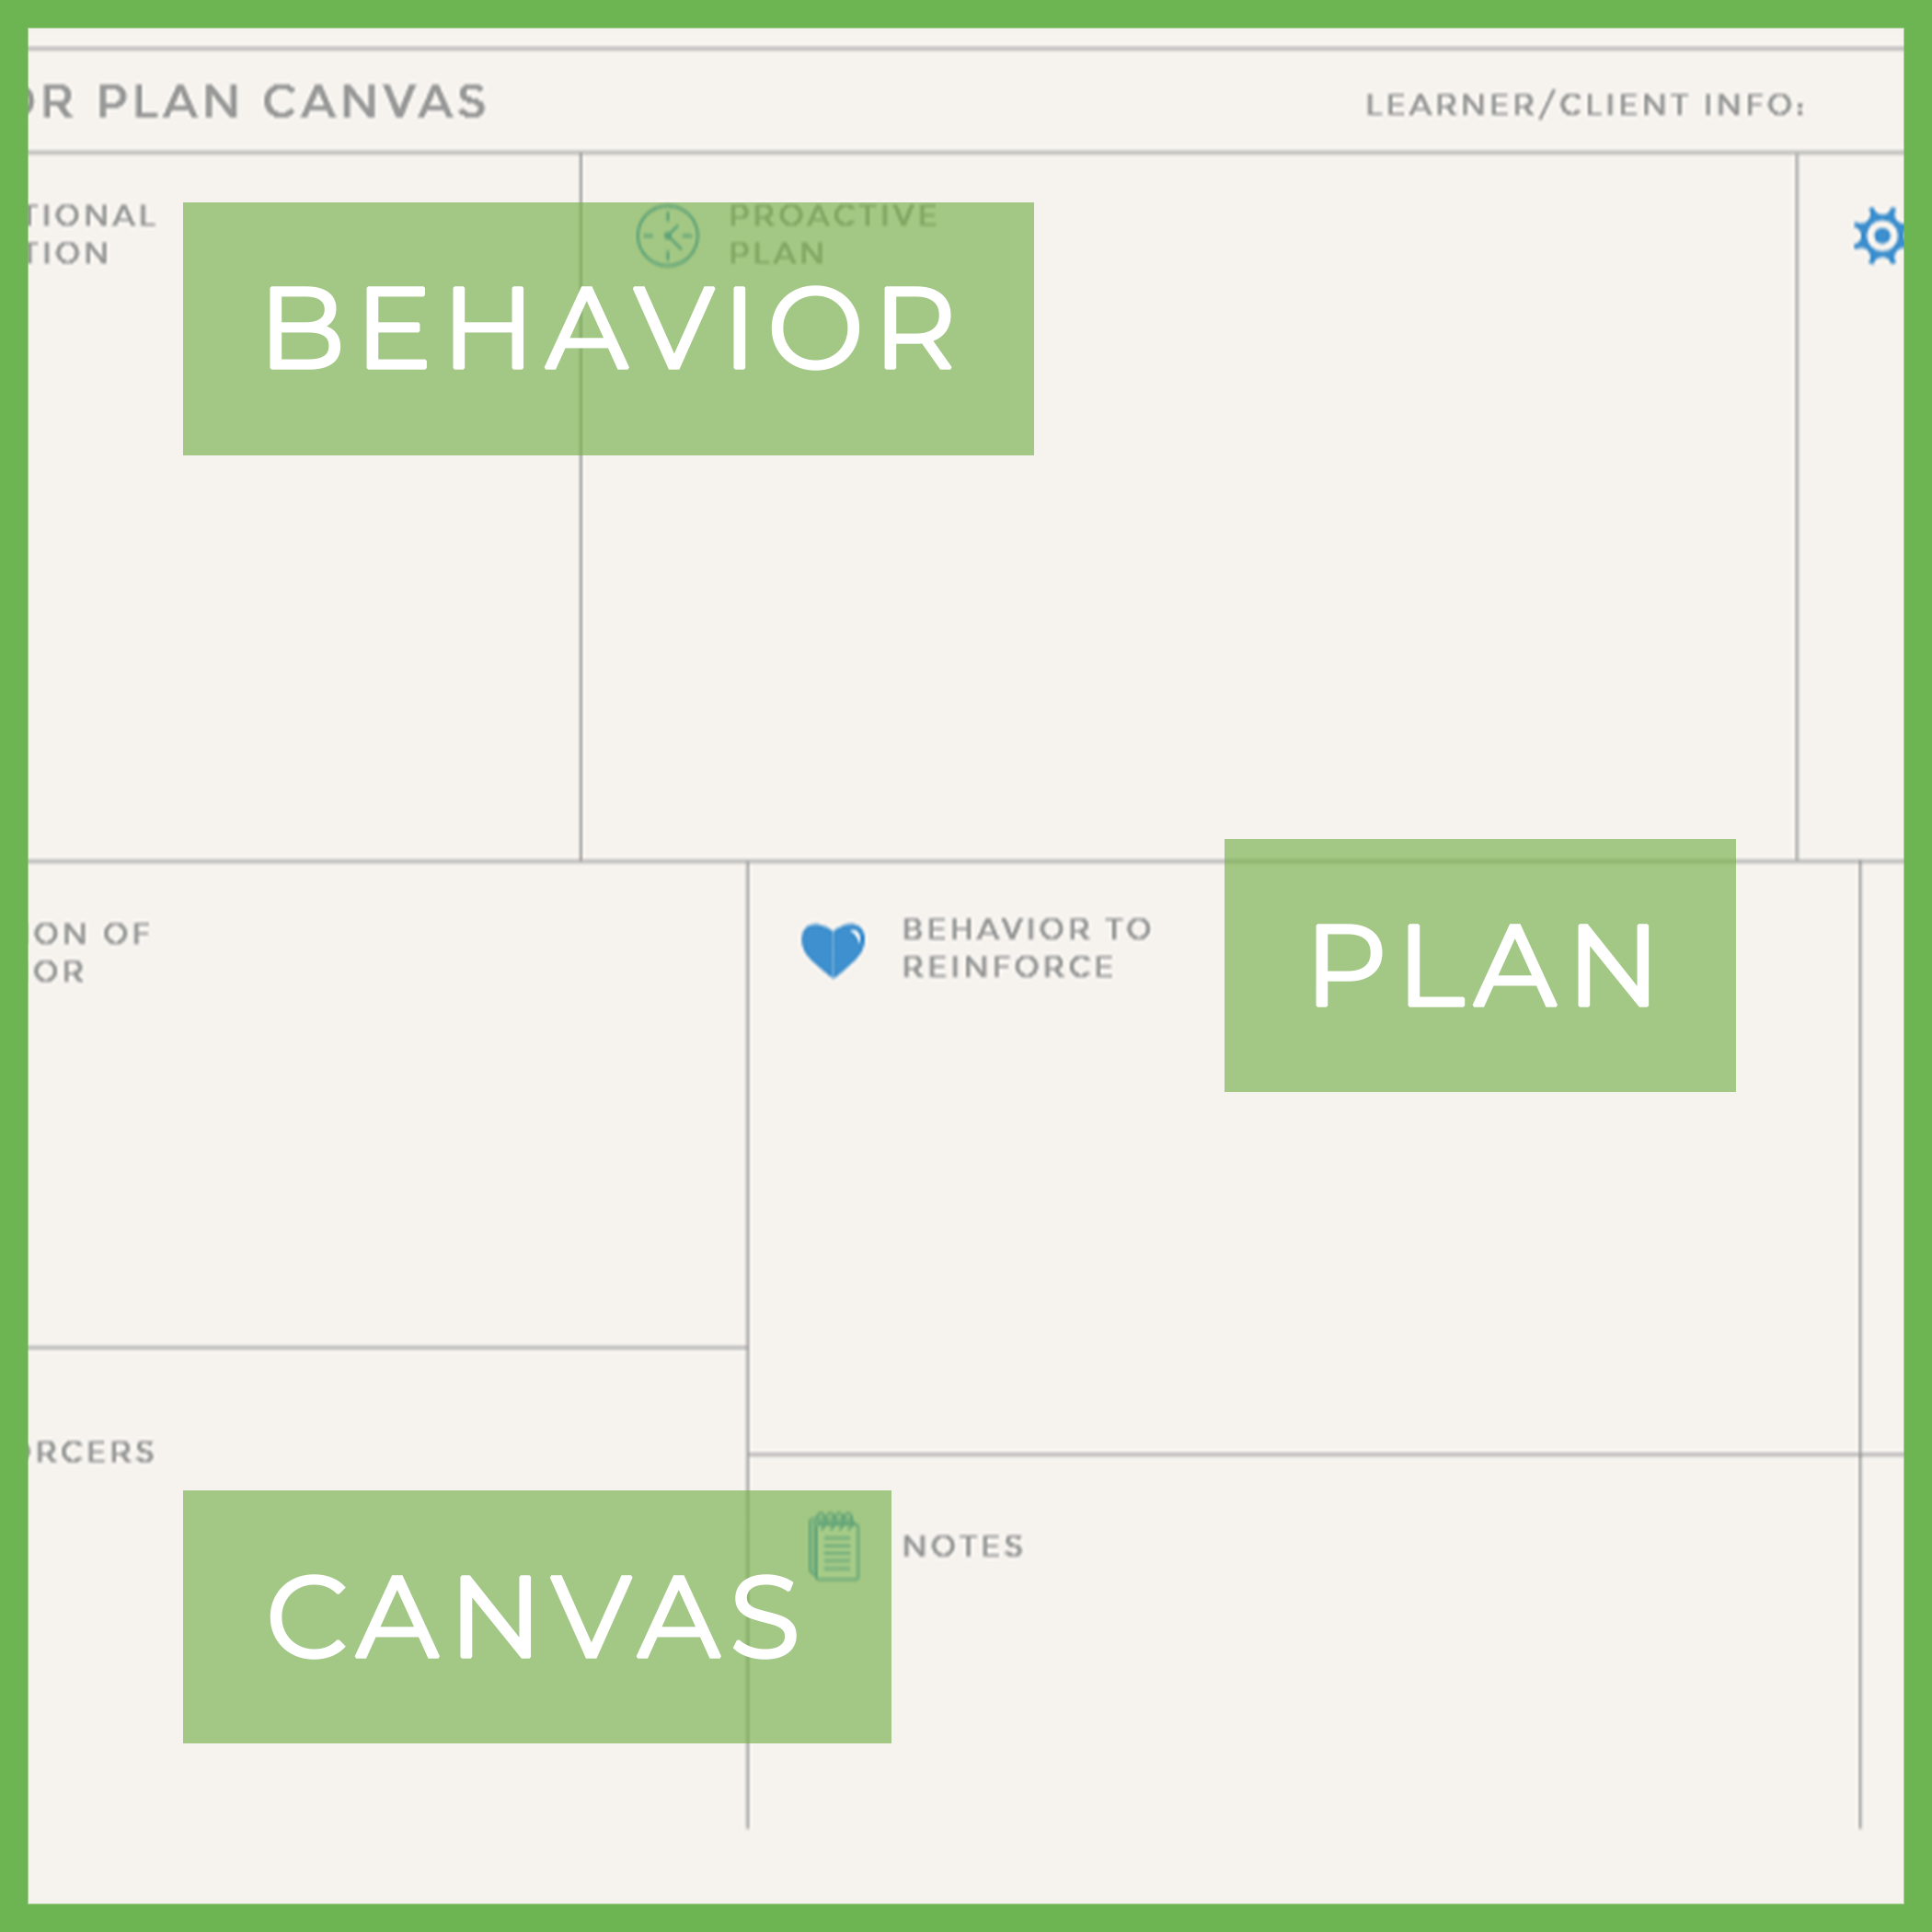 behavior plan canvas.png